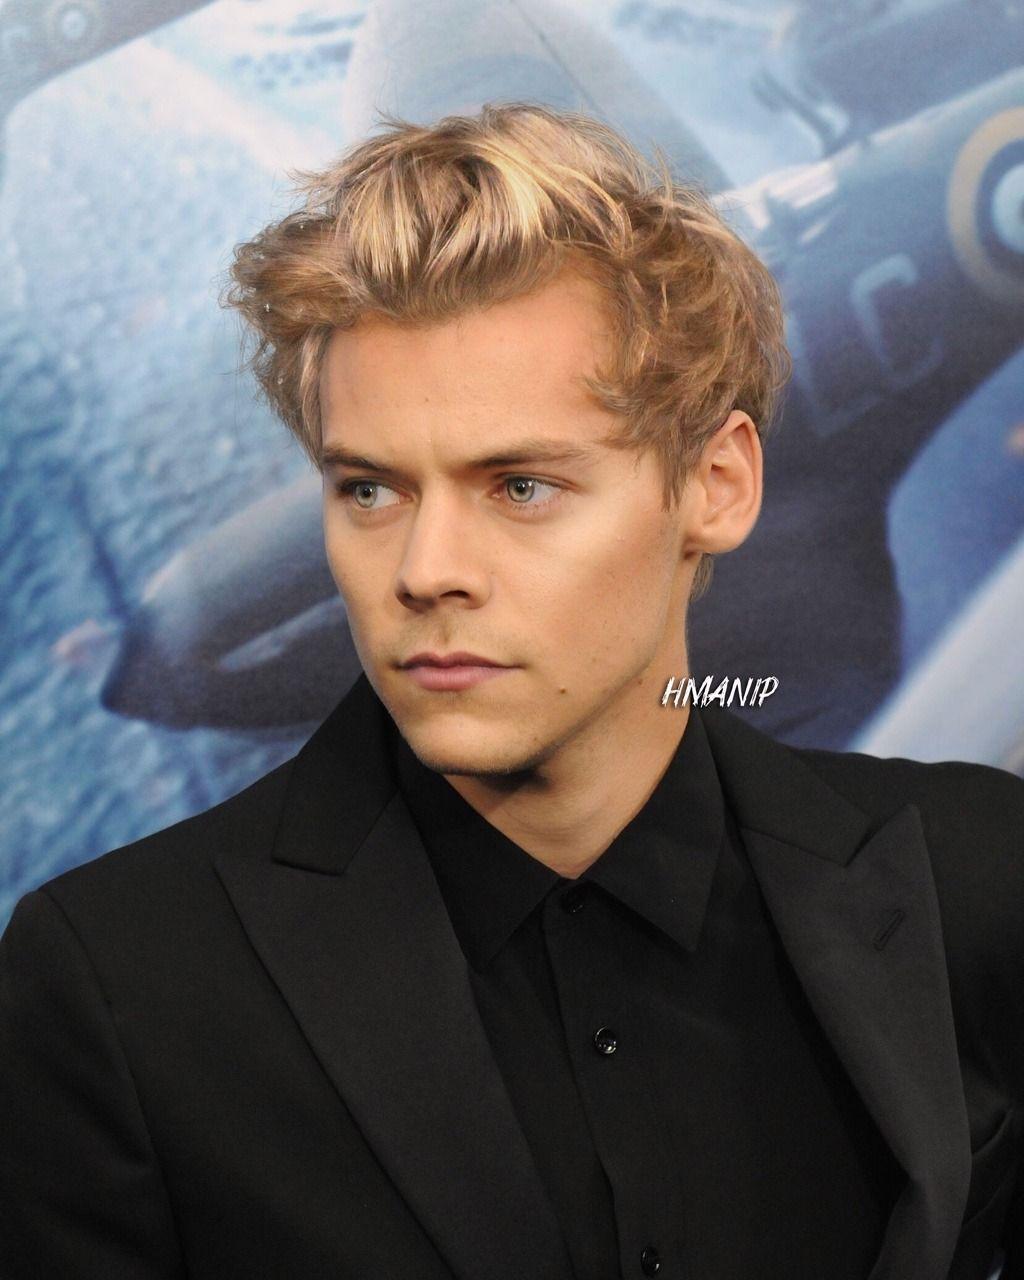 Blonde Harry In 2020 Harry Styles Hair Harry Styles Photos Harry Styles Edits